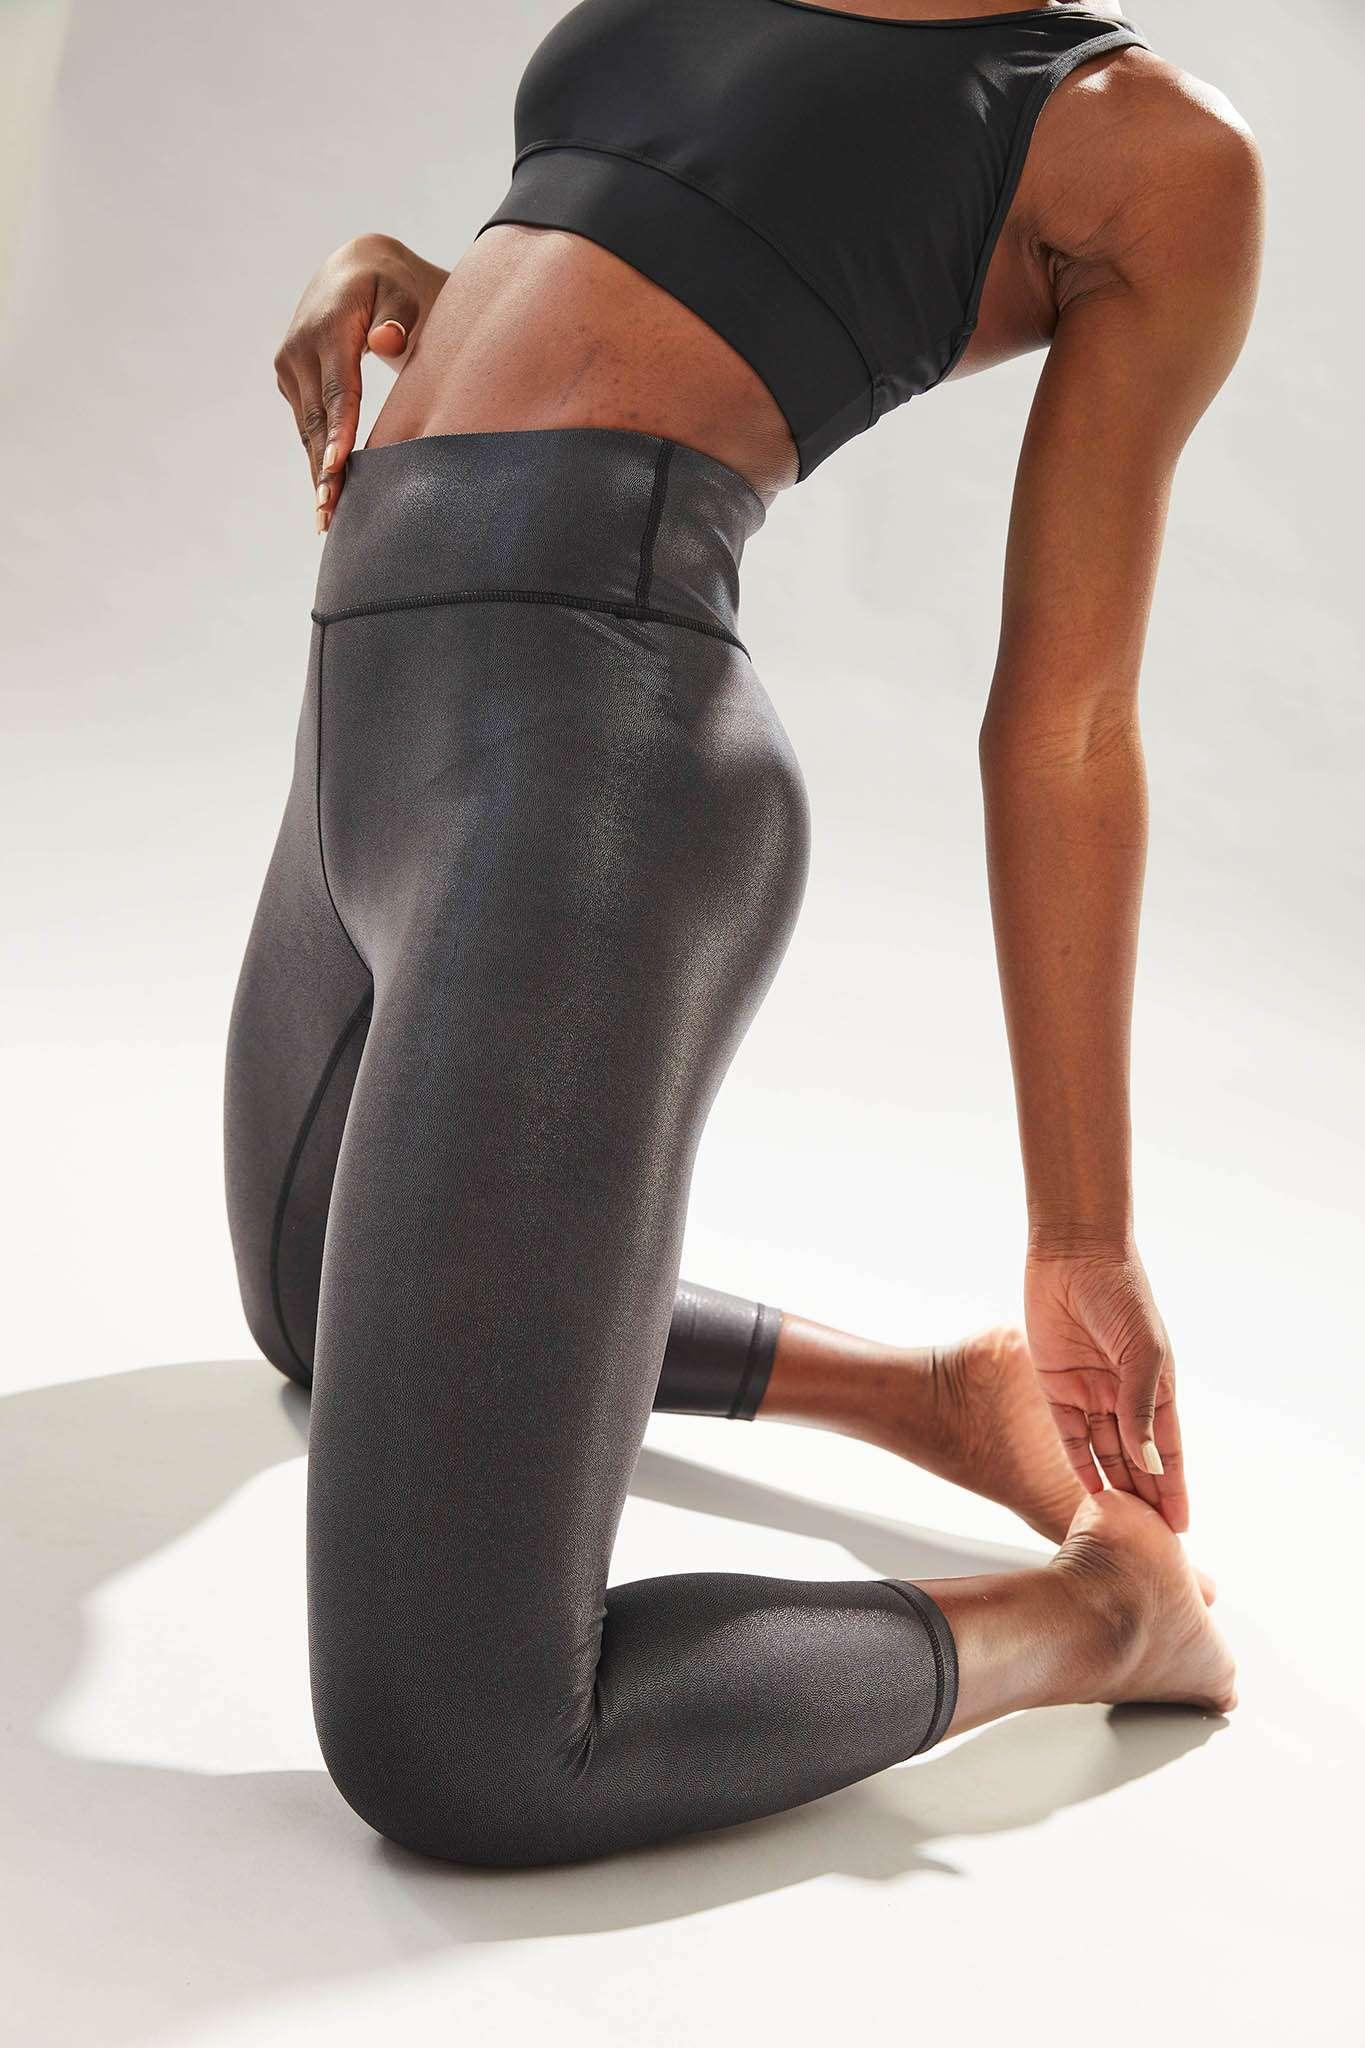 Dharma Bums Twilight Metallic midi Yoga Leggings - Black